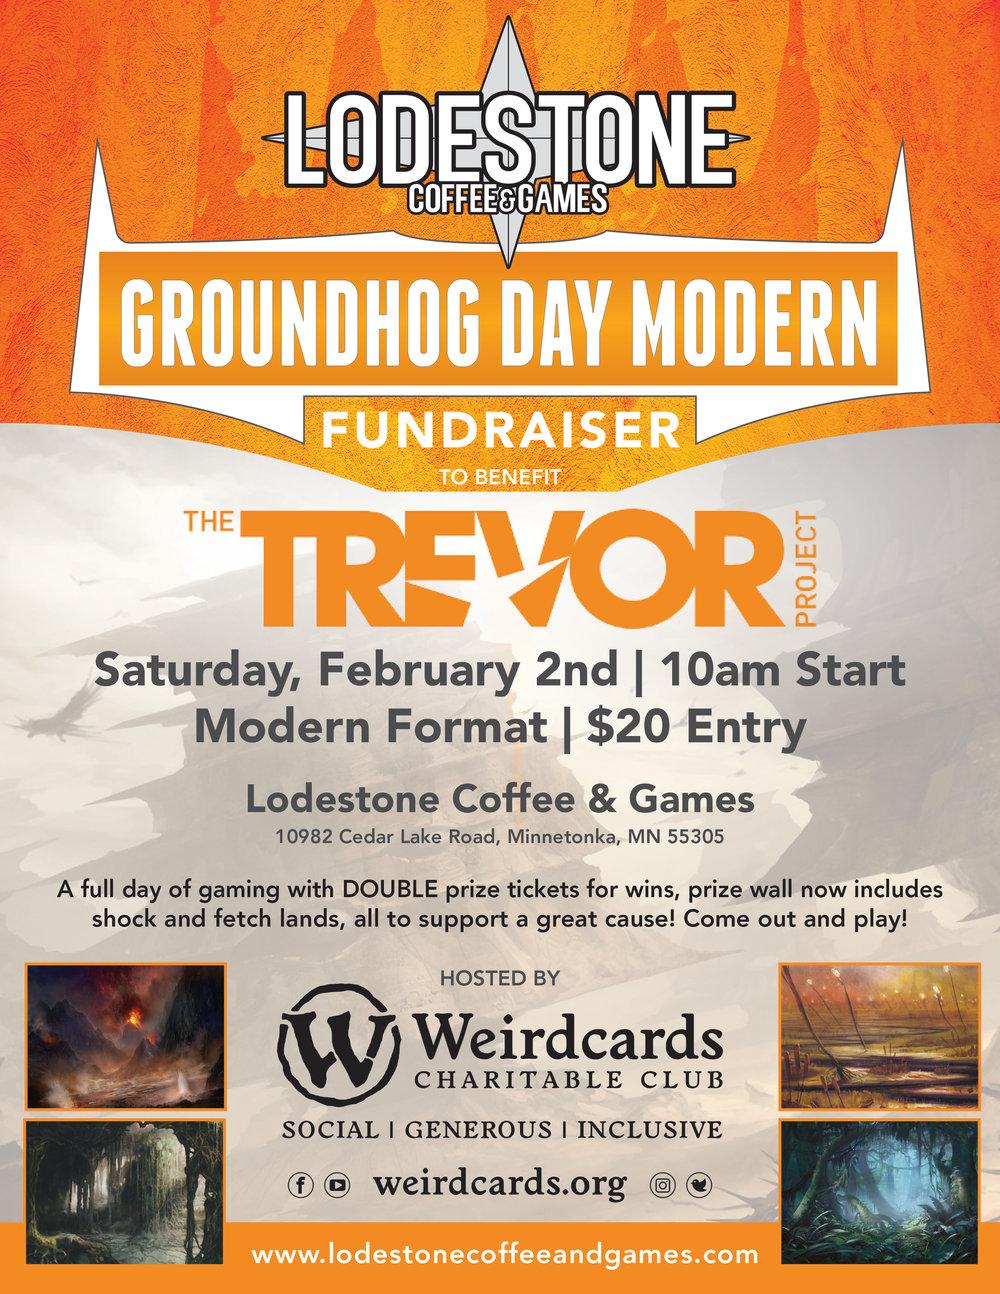 weirdcards_events_-_lodestone_190202.jpg